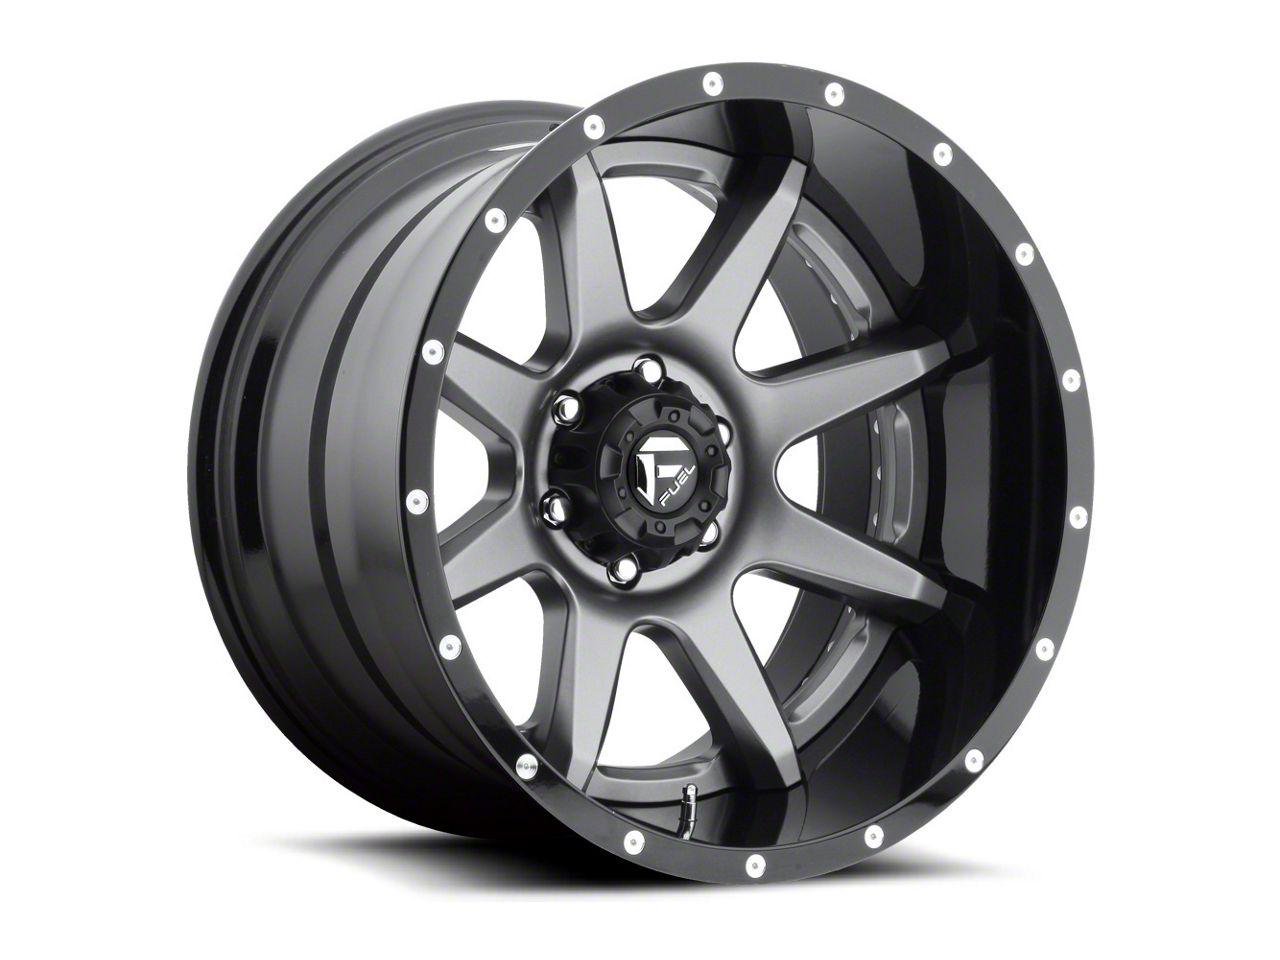 Fuel Wheels Rampage Gun Metal 6-Lug Wheel - 20x10 (99-18 Silverado 1500)